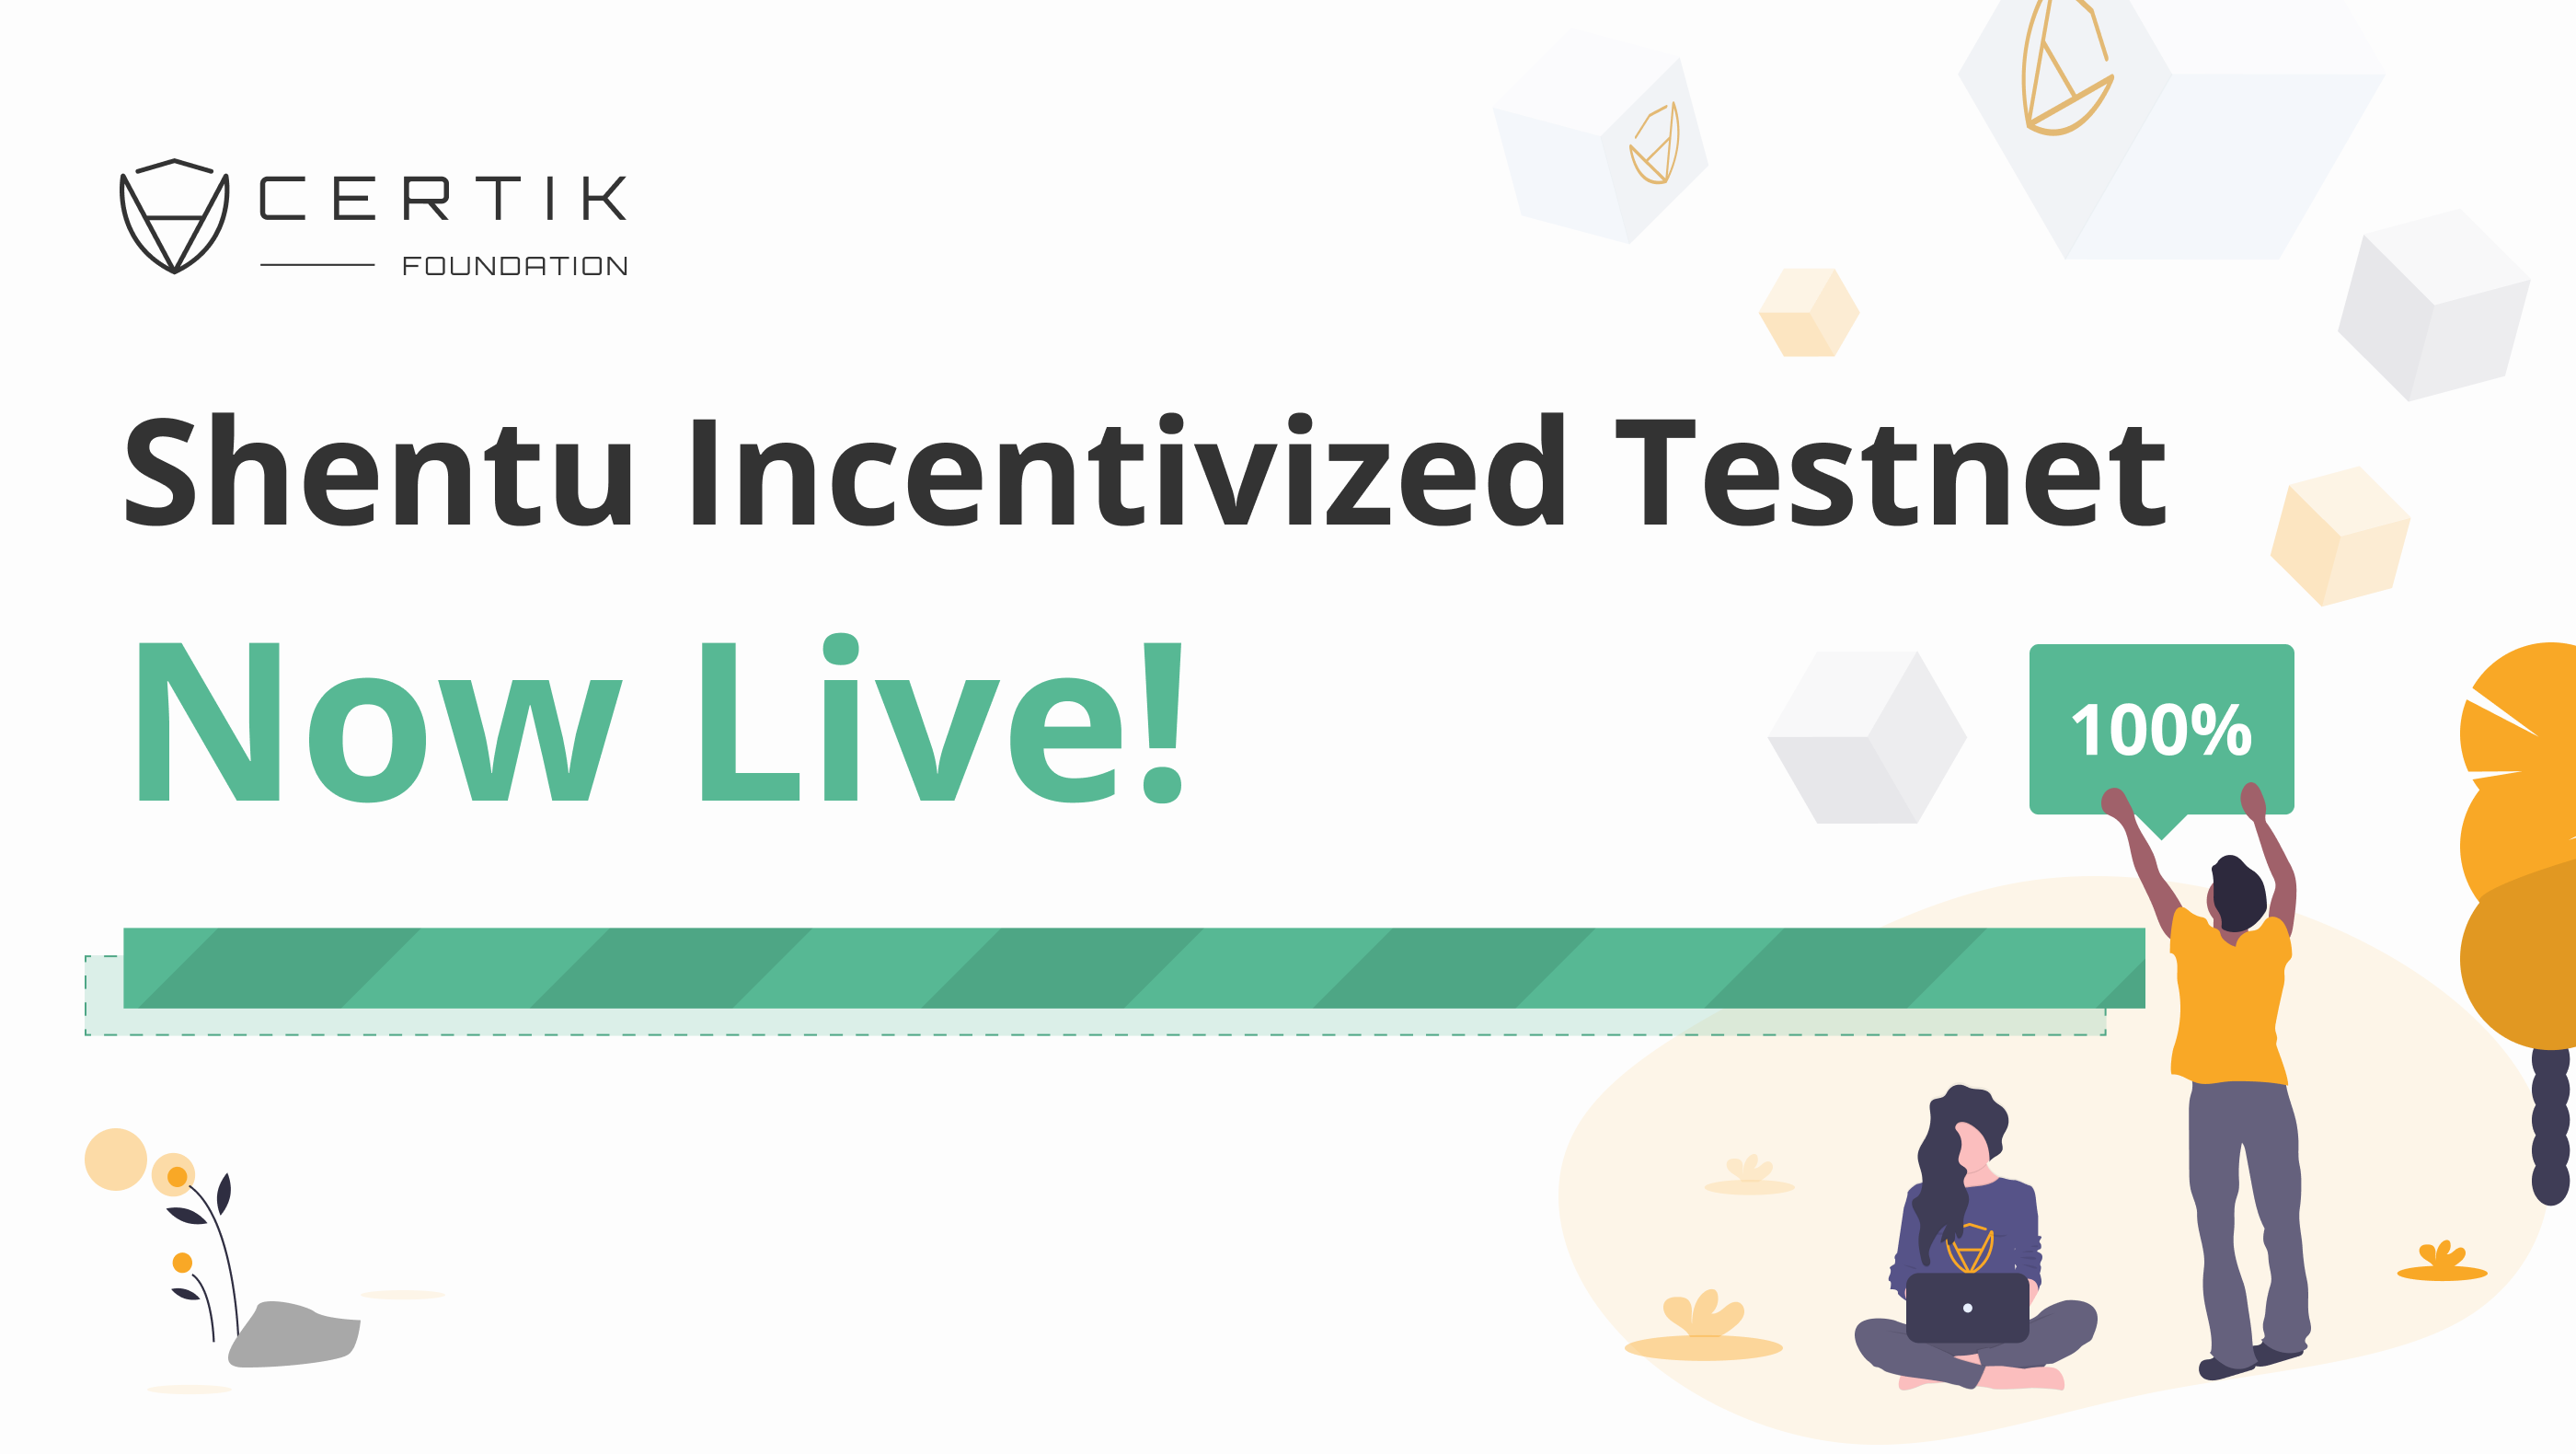 CertiK Chain Incentivized Testnet Is Now Live